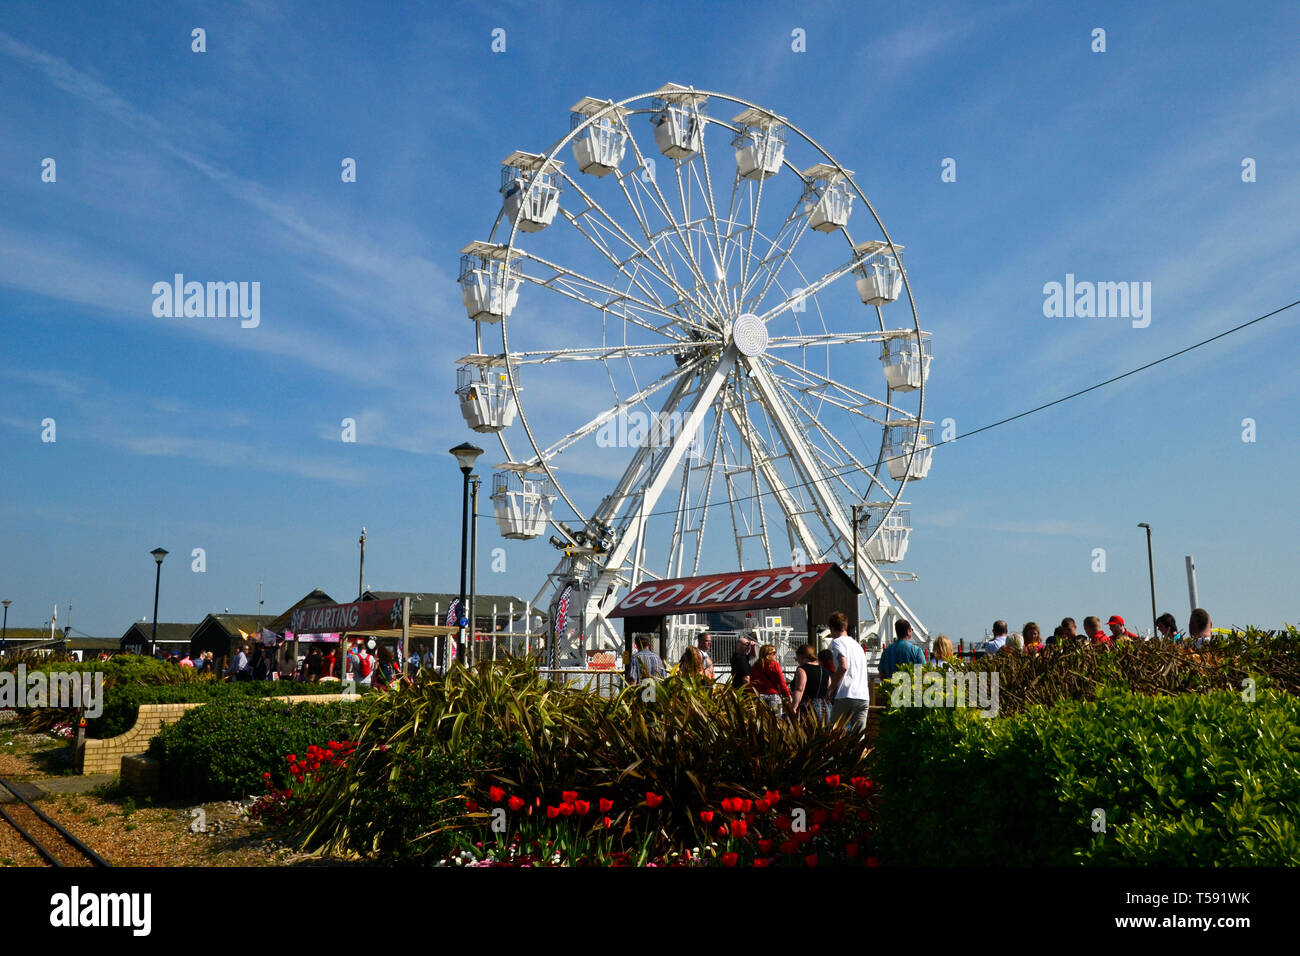 New ferris wheel on Hastings Seafront, Hastings, East Sussex, UK Stock Photo